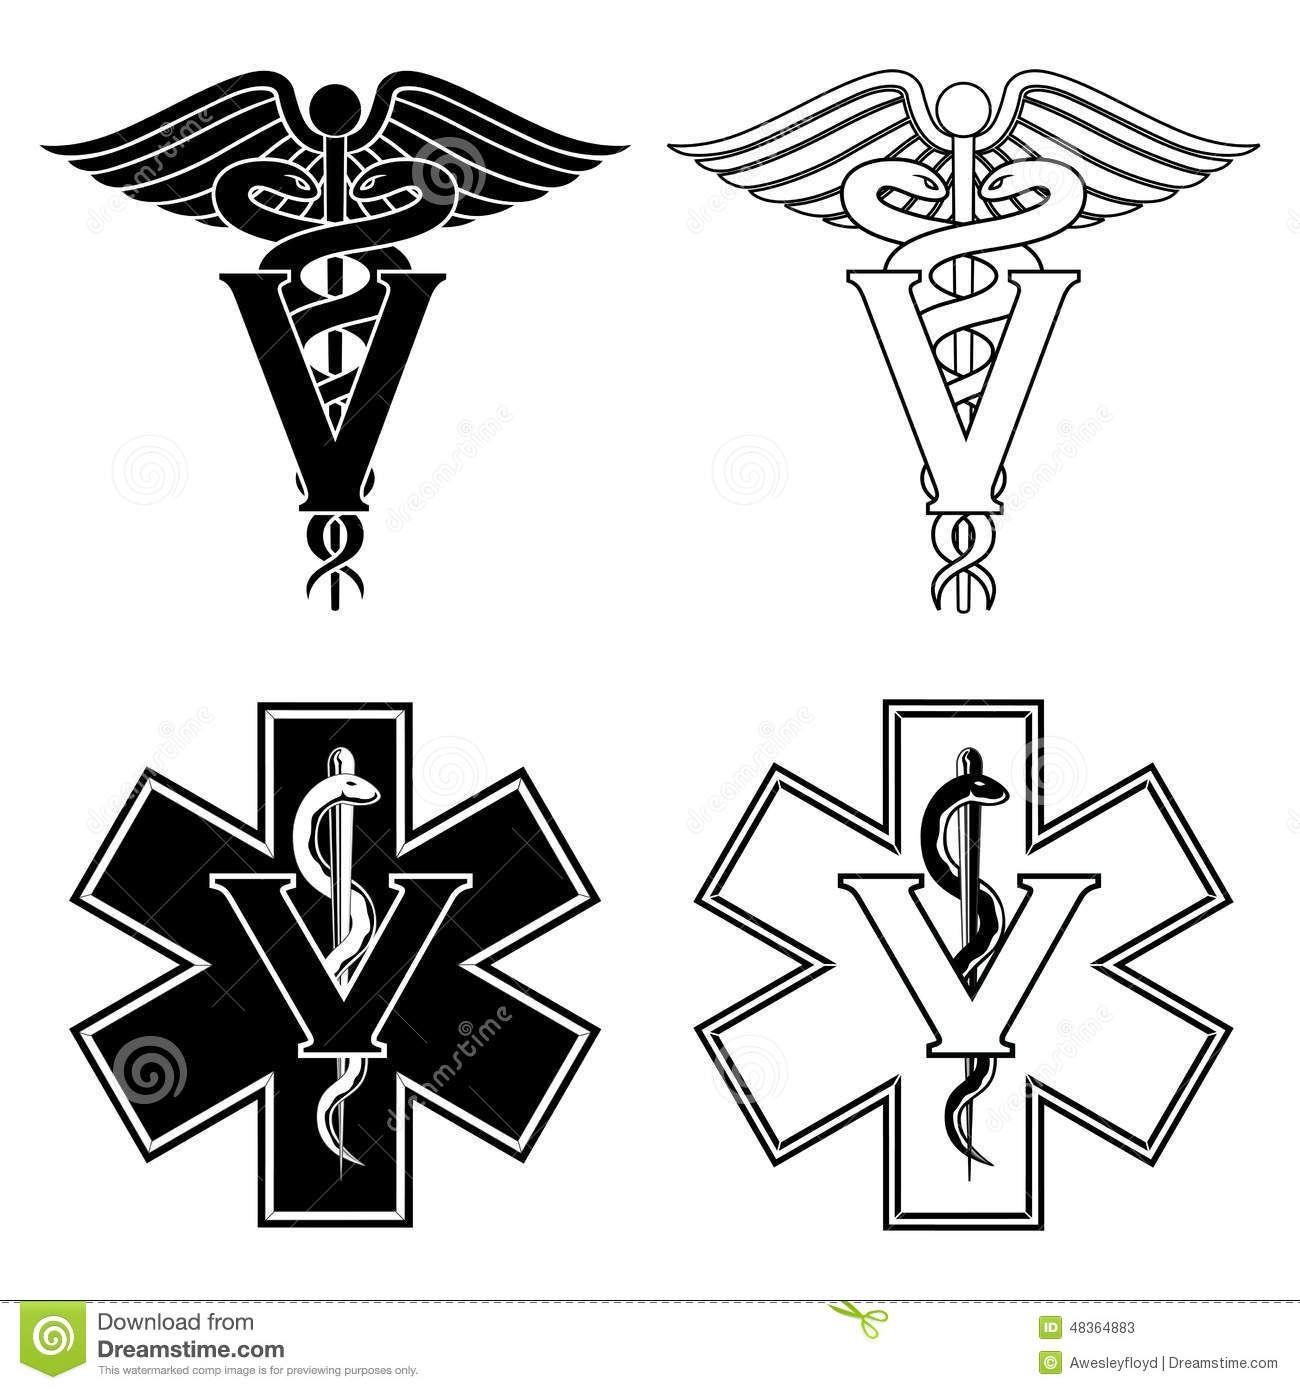 veterinarian symbols Google Search Medical symbols